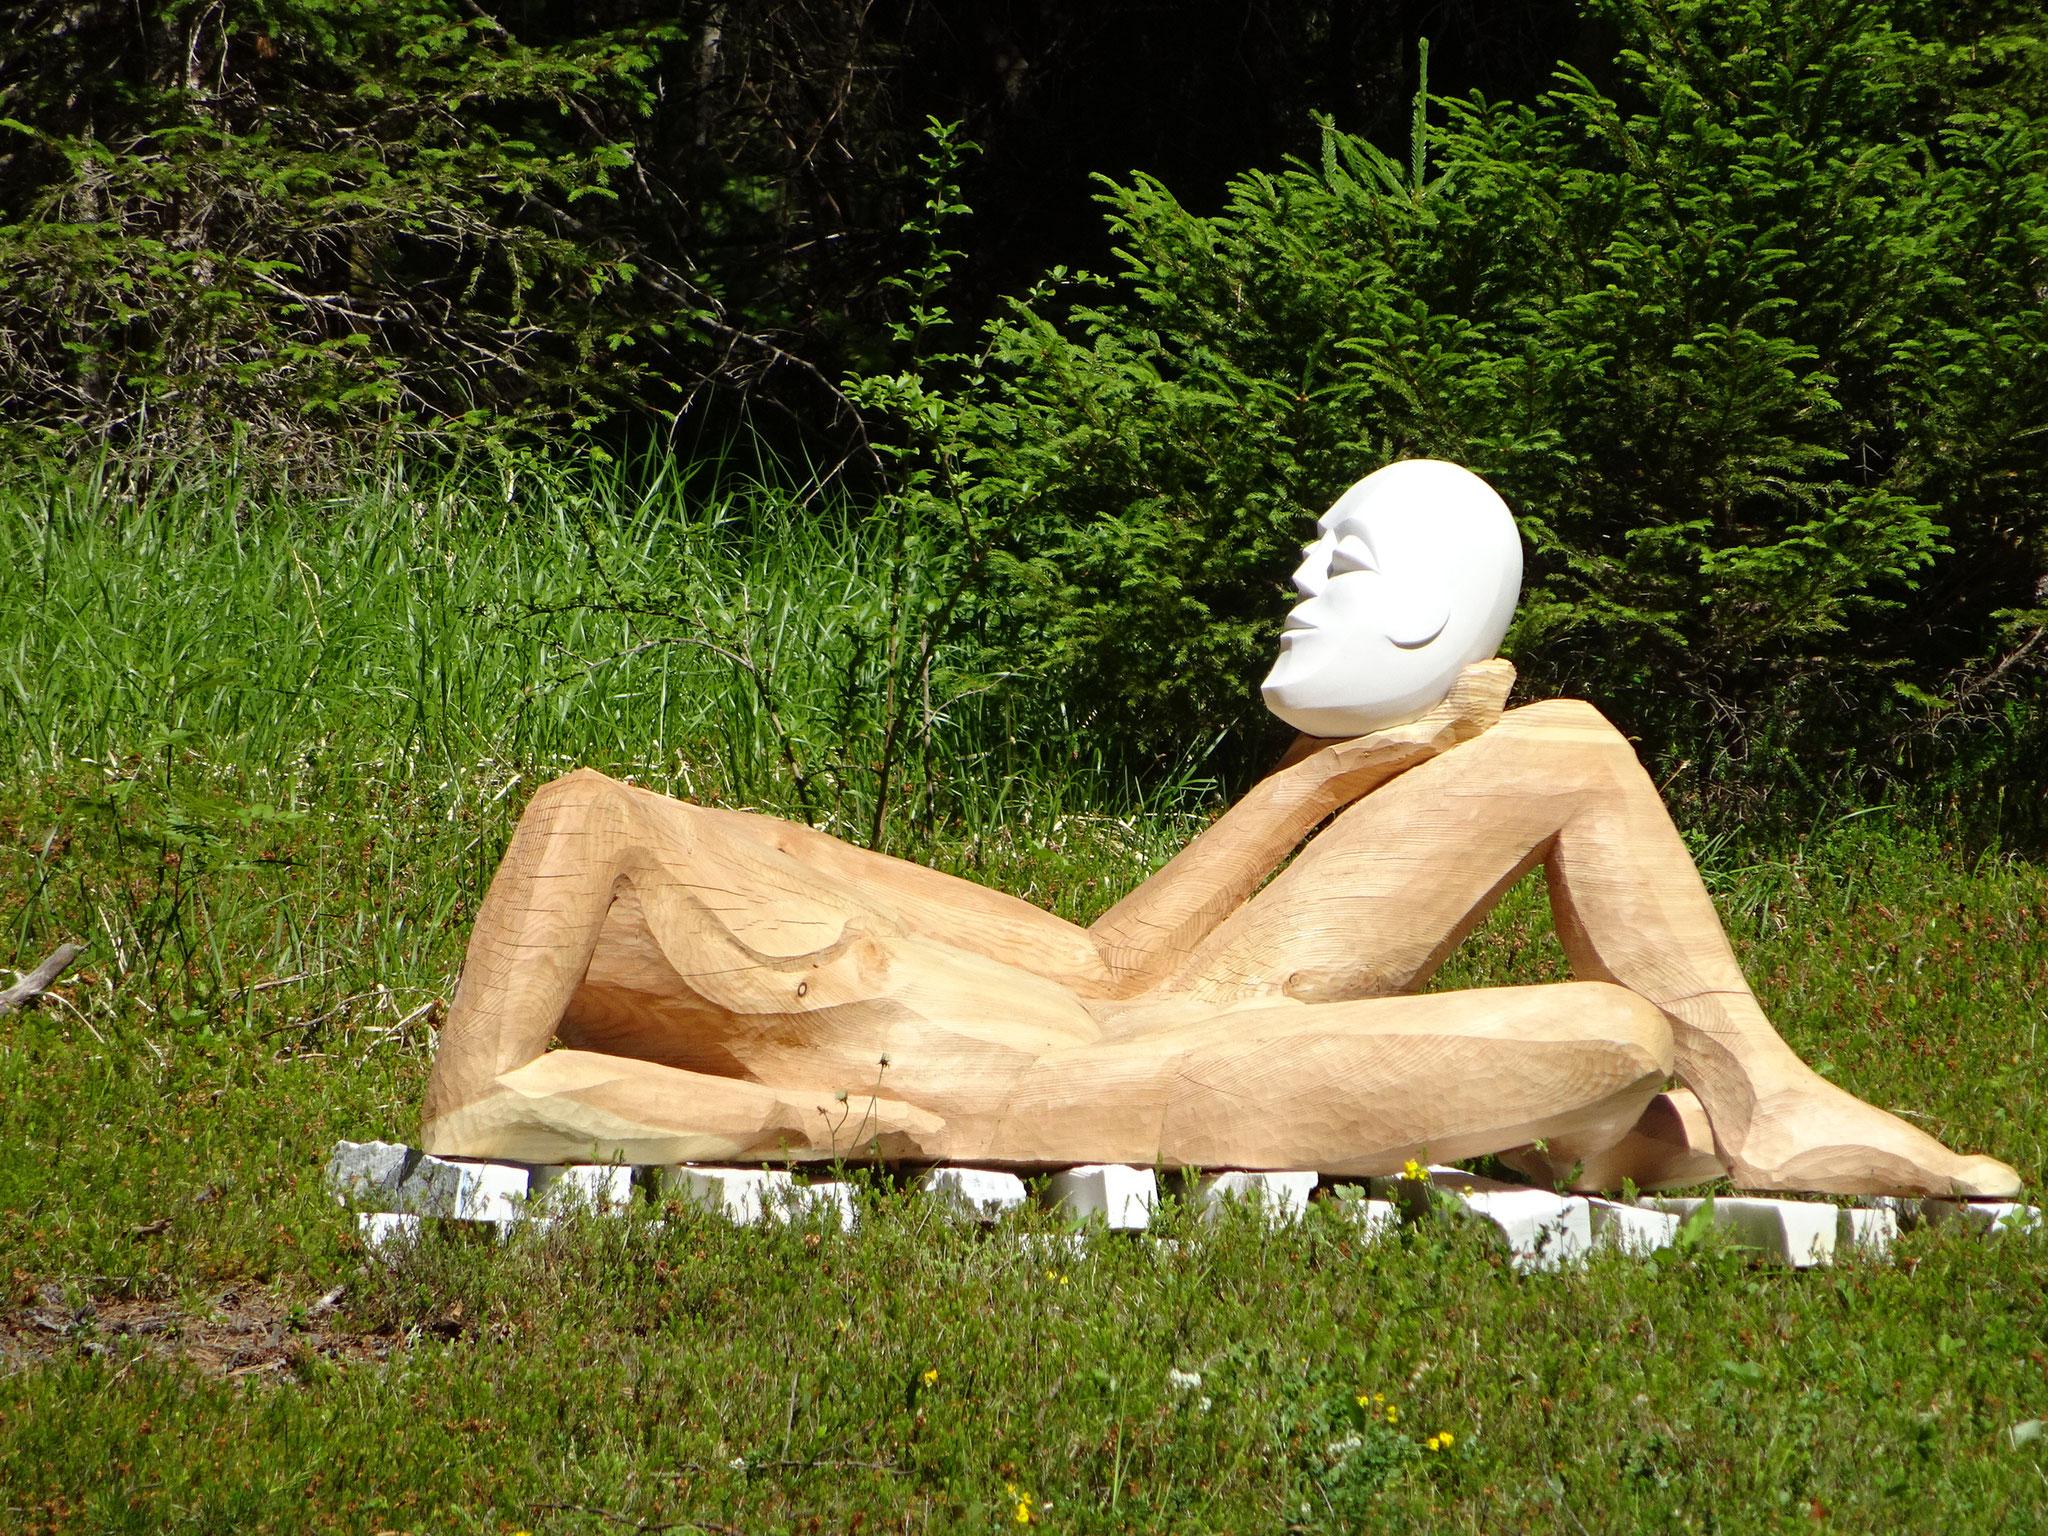 The lounging men - Who am I? 2017 Holzbildhauer Symposium Sur En/Sent